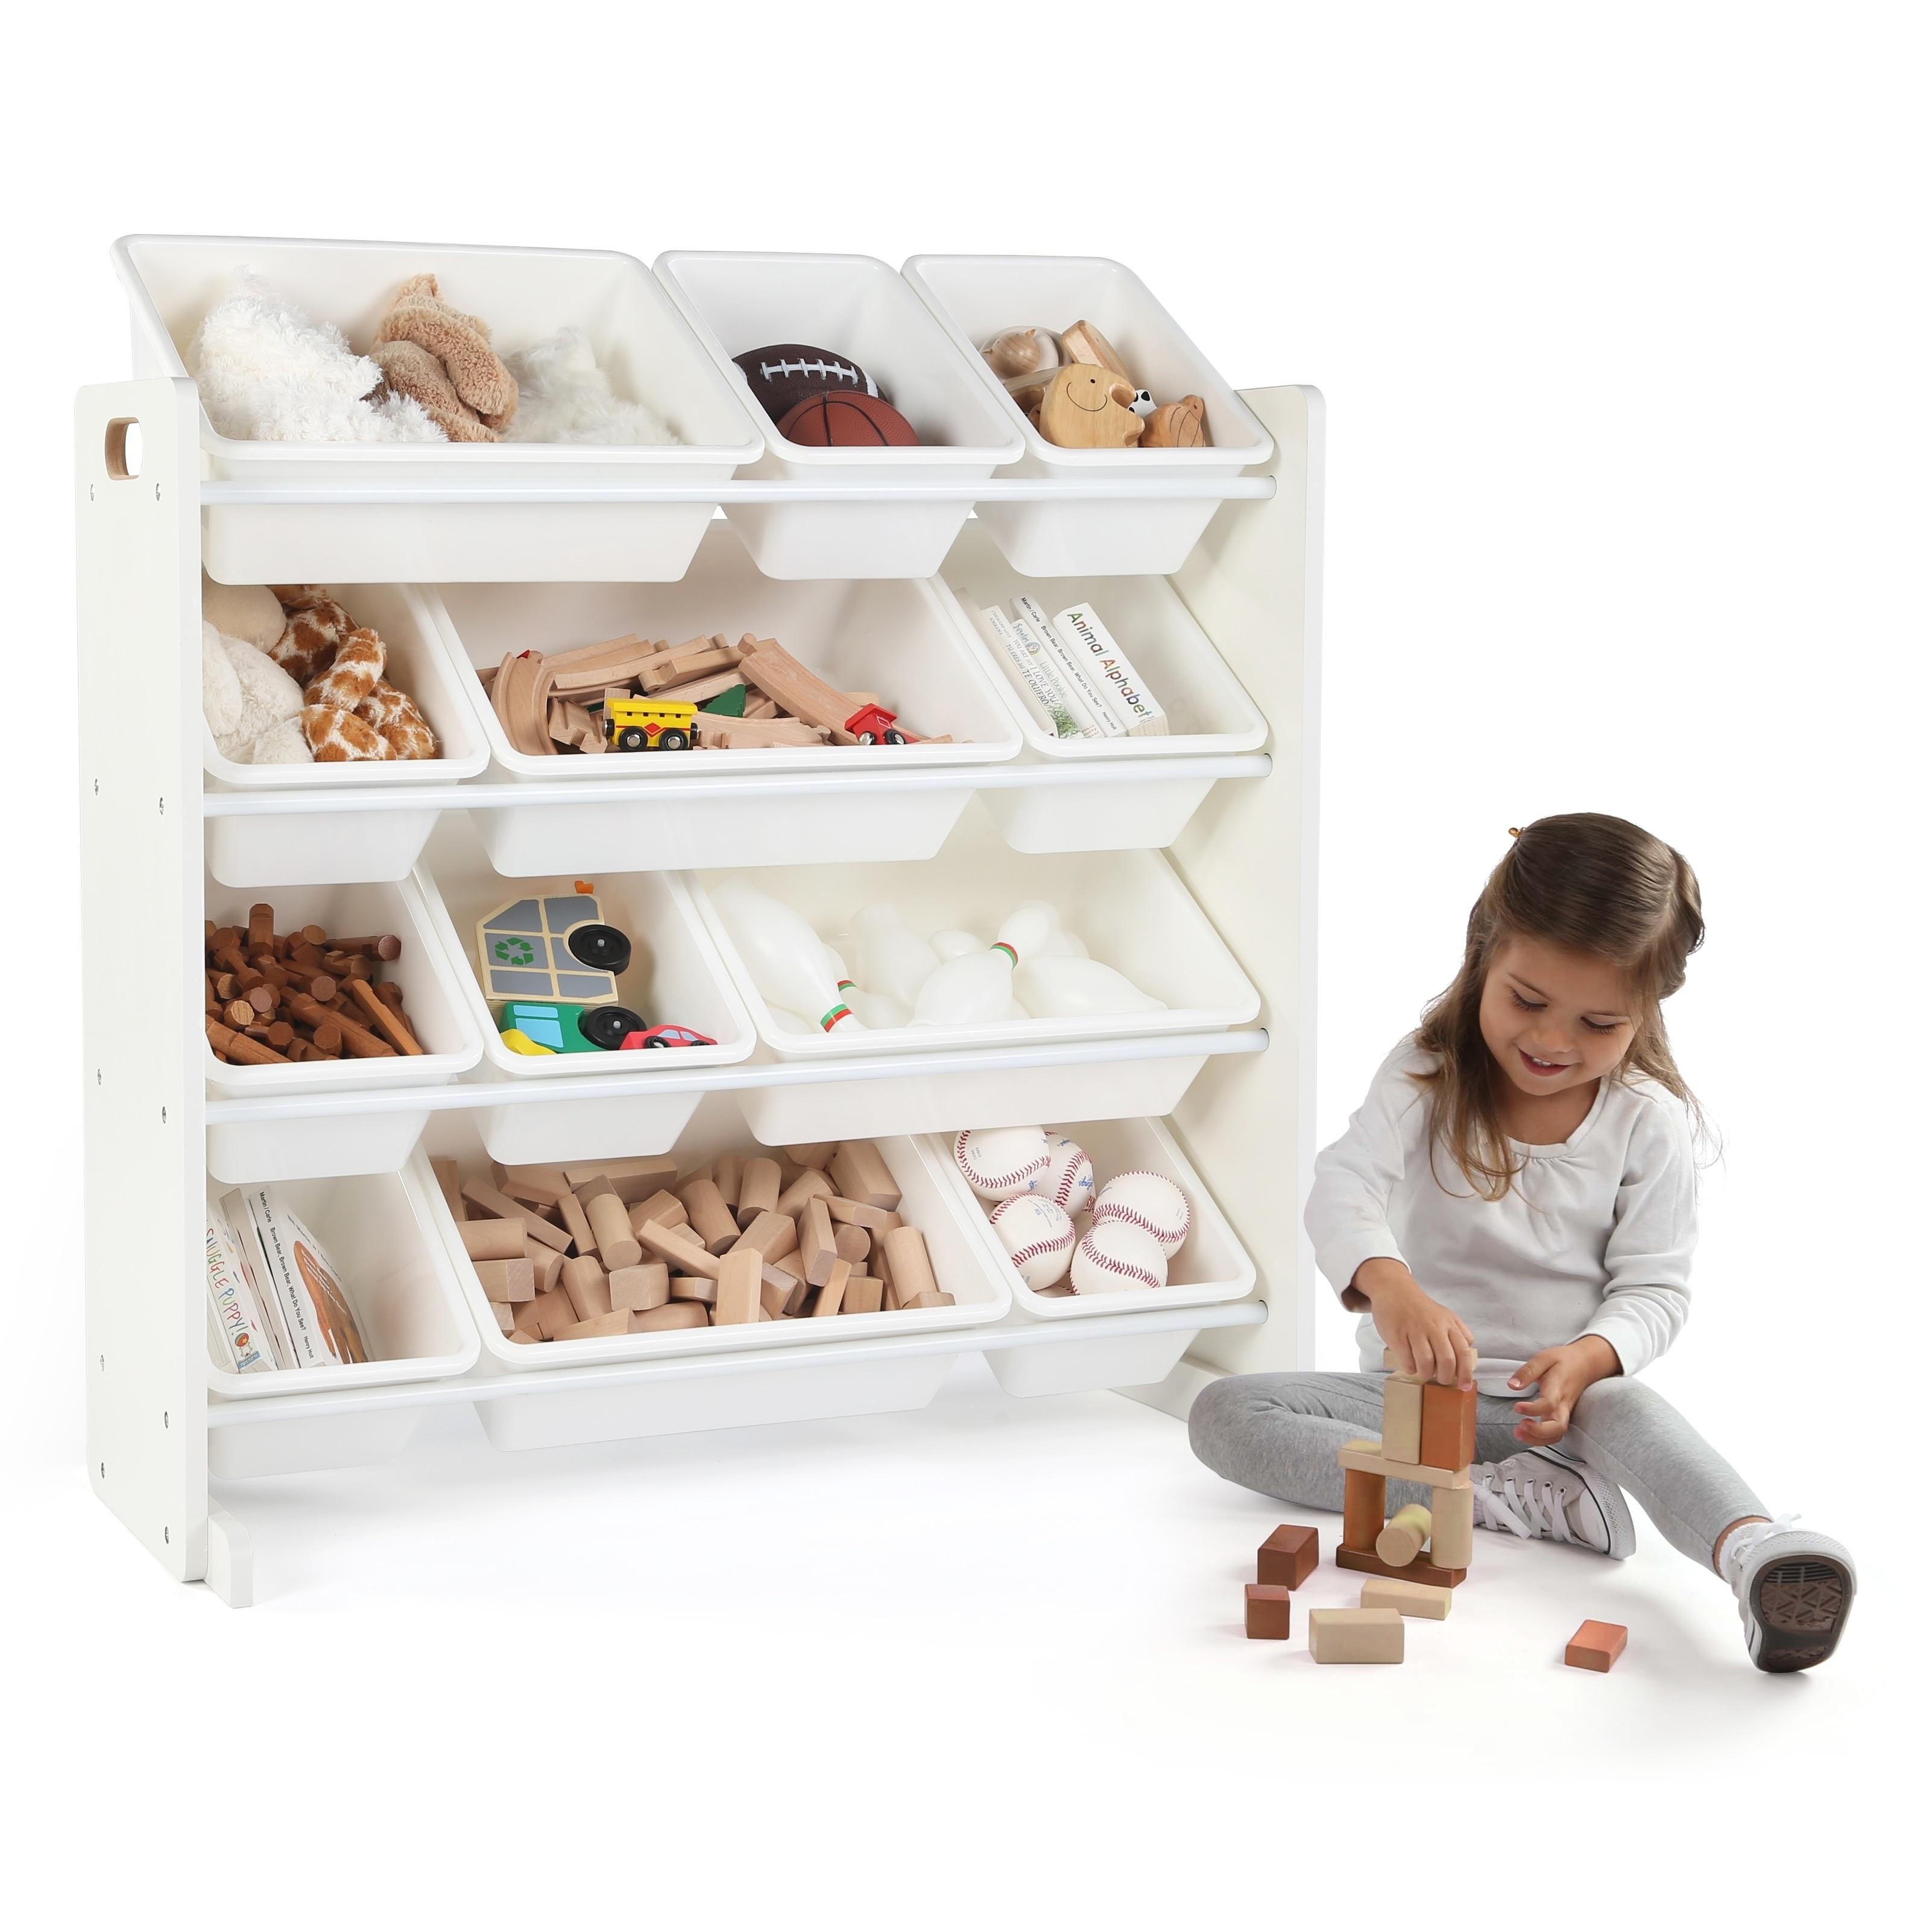 cambridge kids toy storage organizer w 12 plastic bins. Black Bedroom Furniture Sets. Home Design Ideas